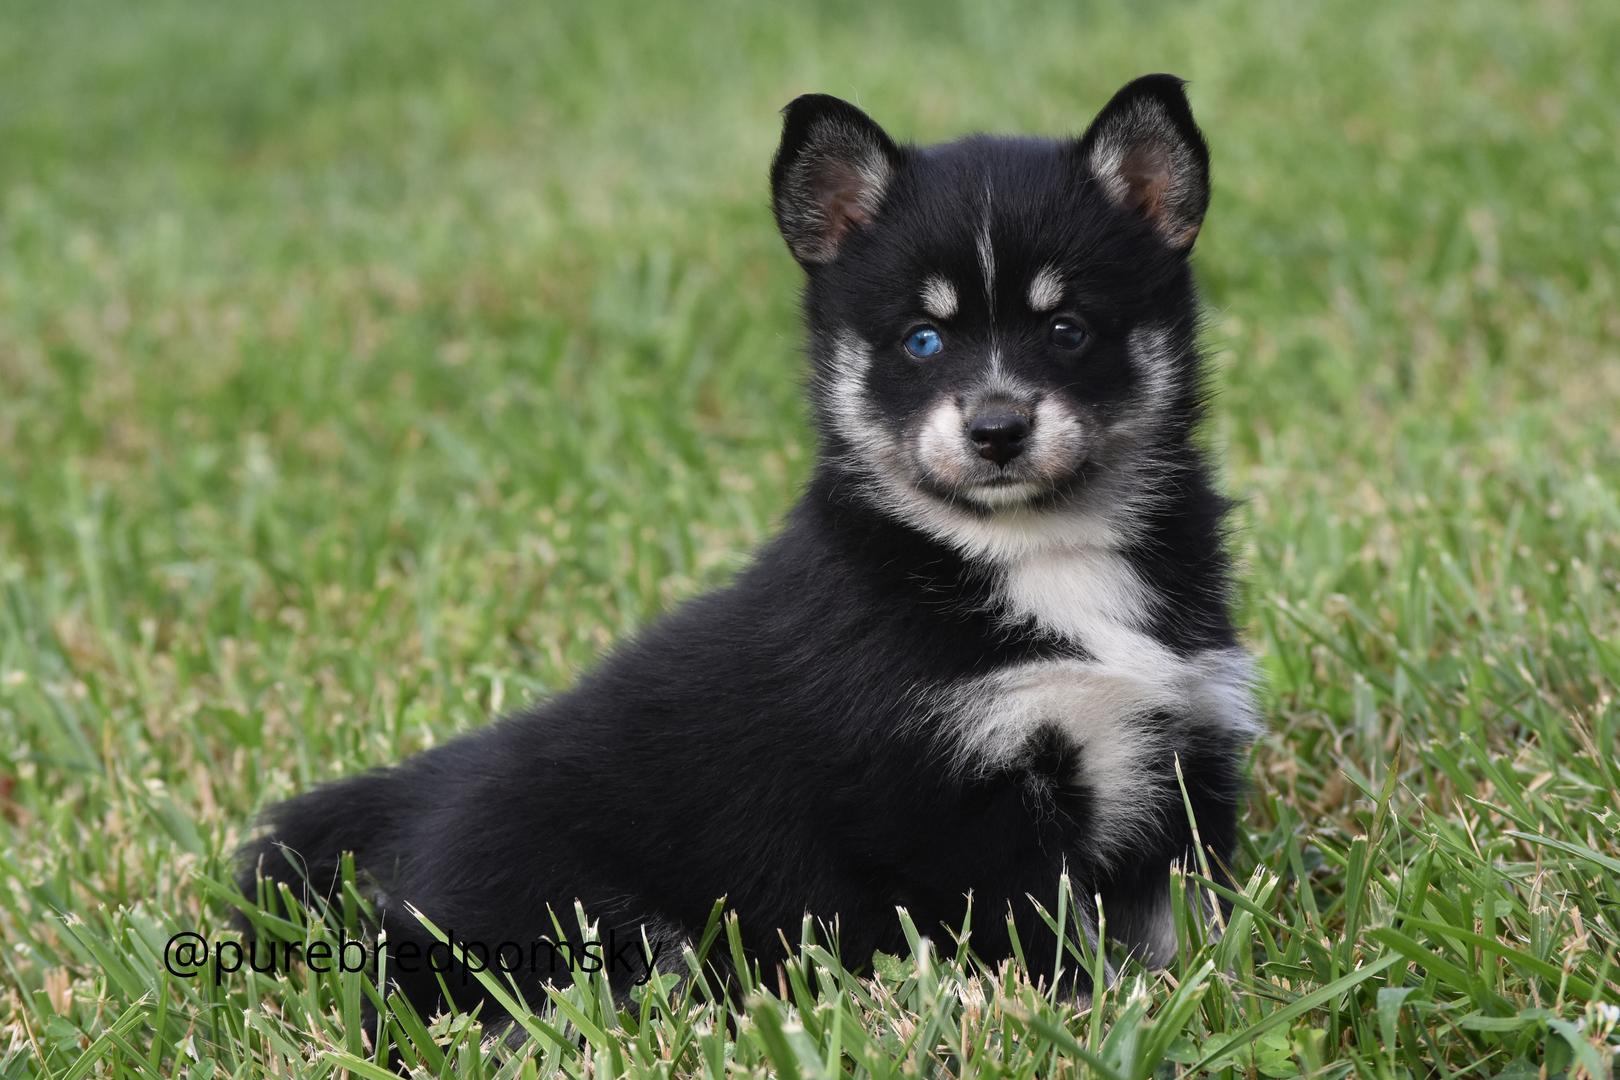 Purebred Pomsky Puppies For Sale - Pomsky breeder